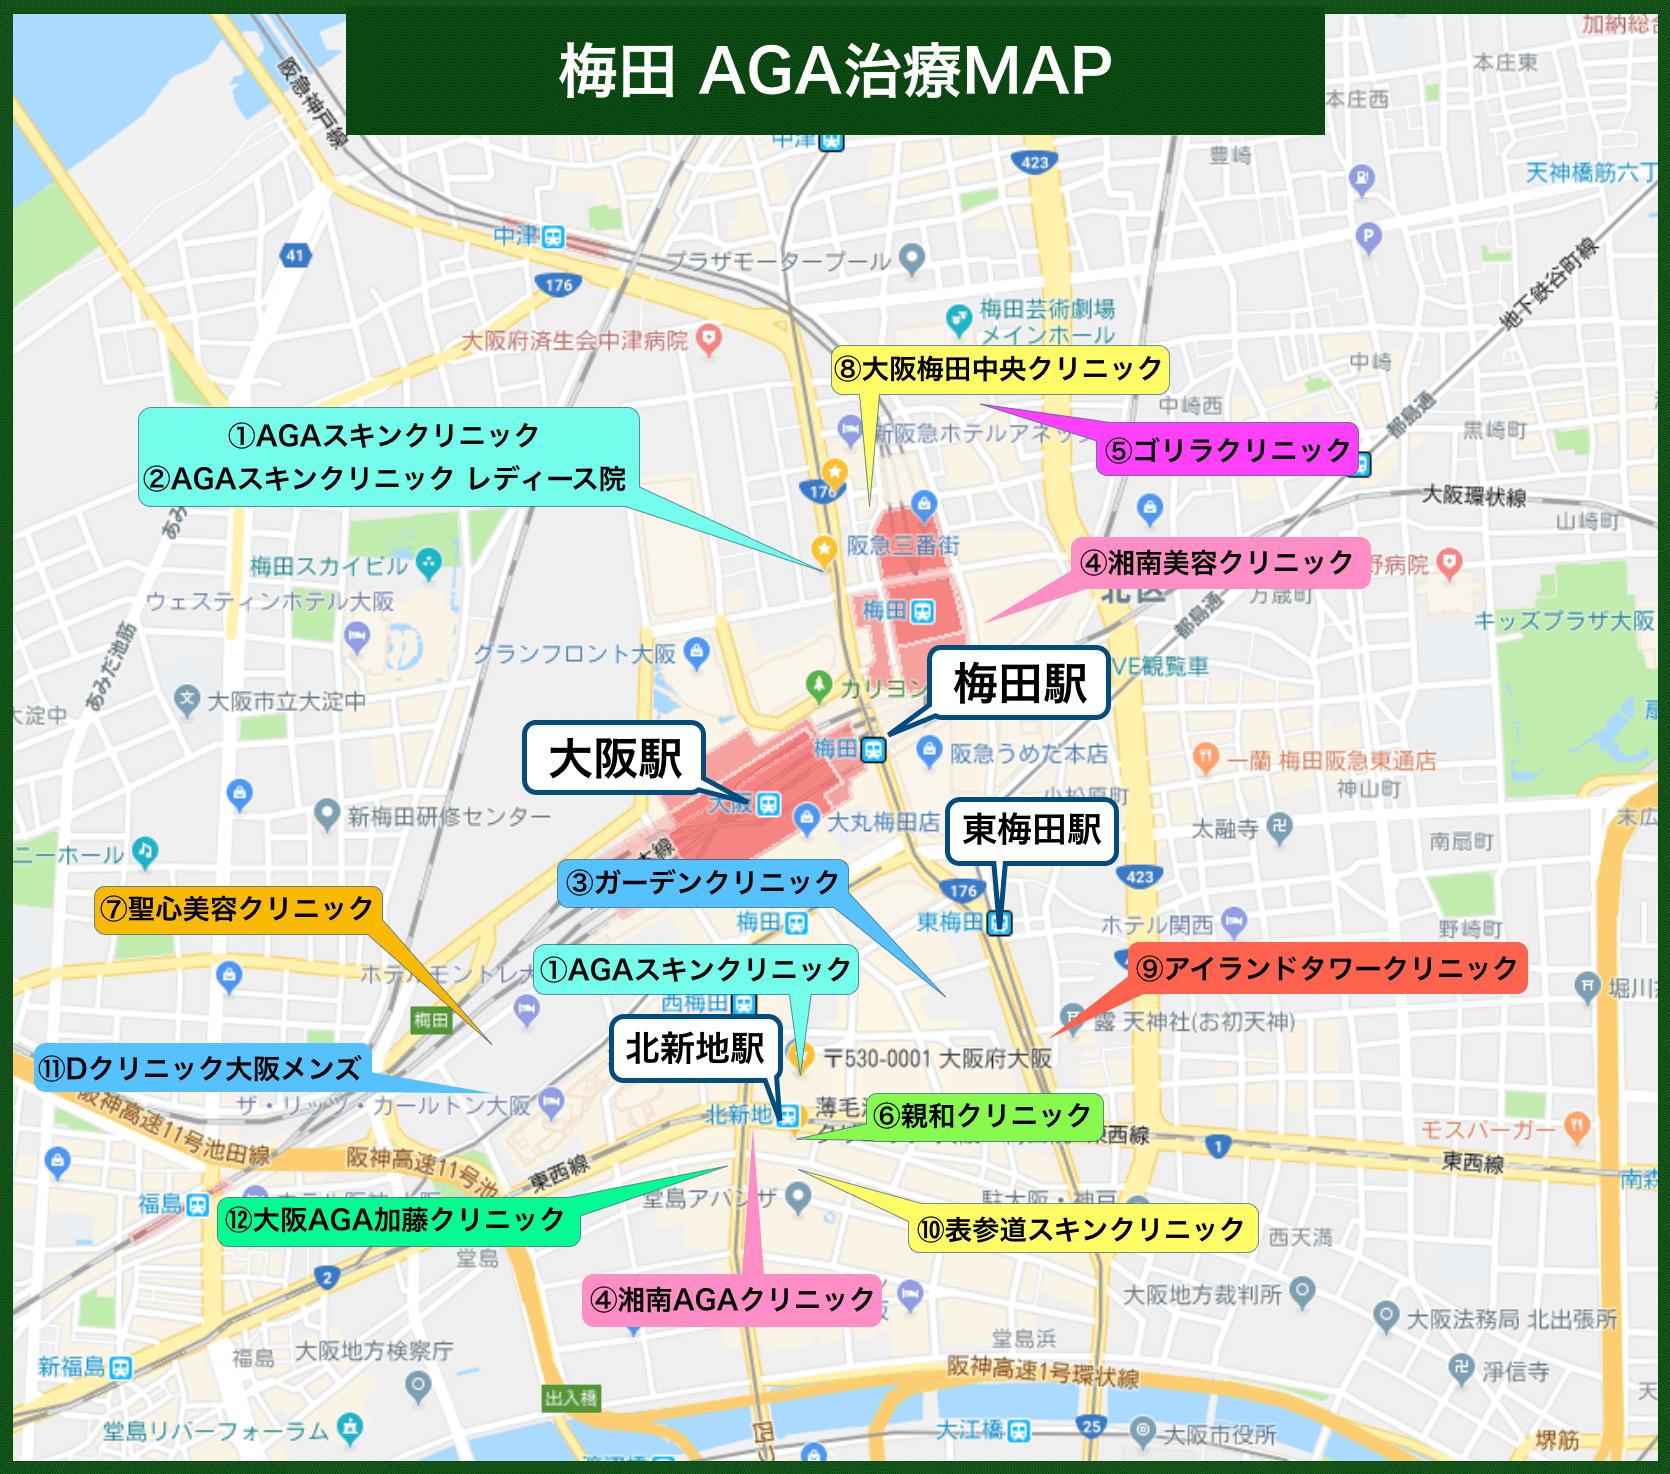 梅田AGA治療MAP(2020年版)